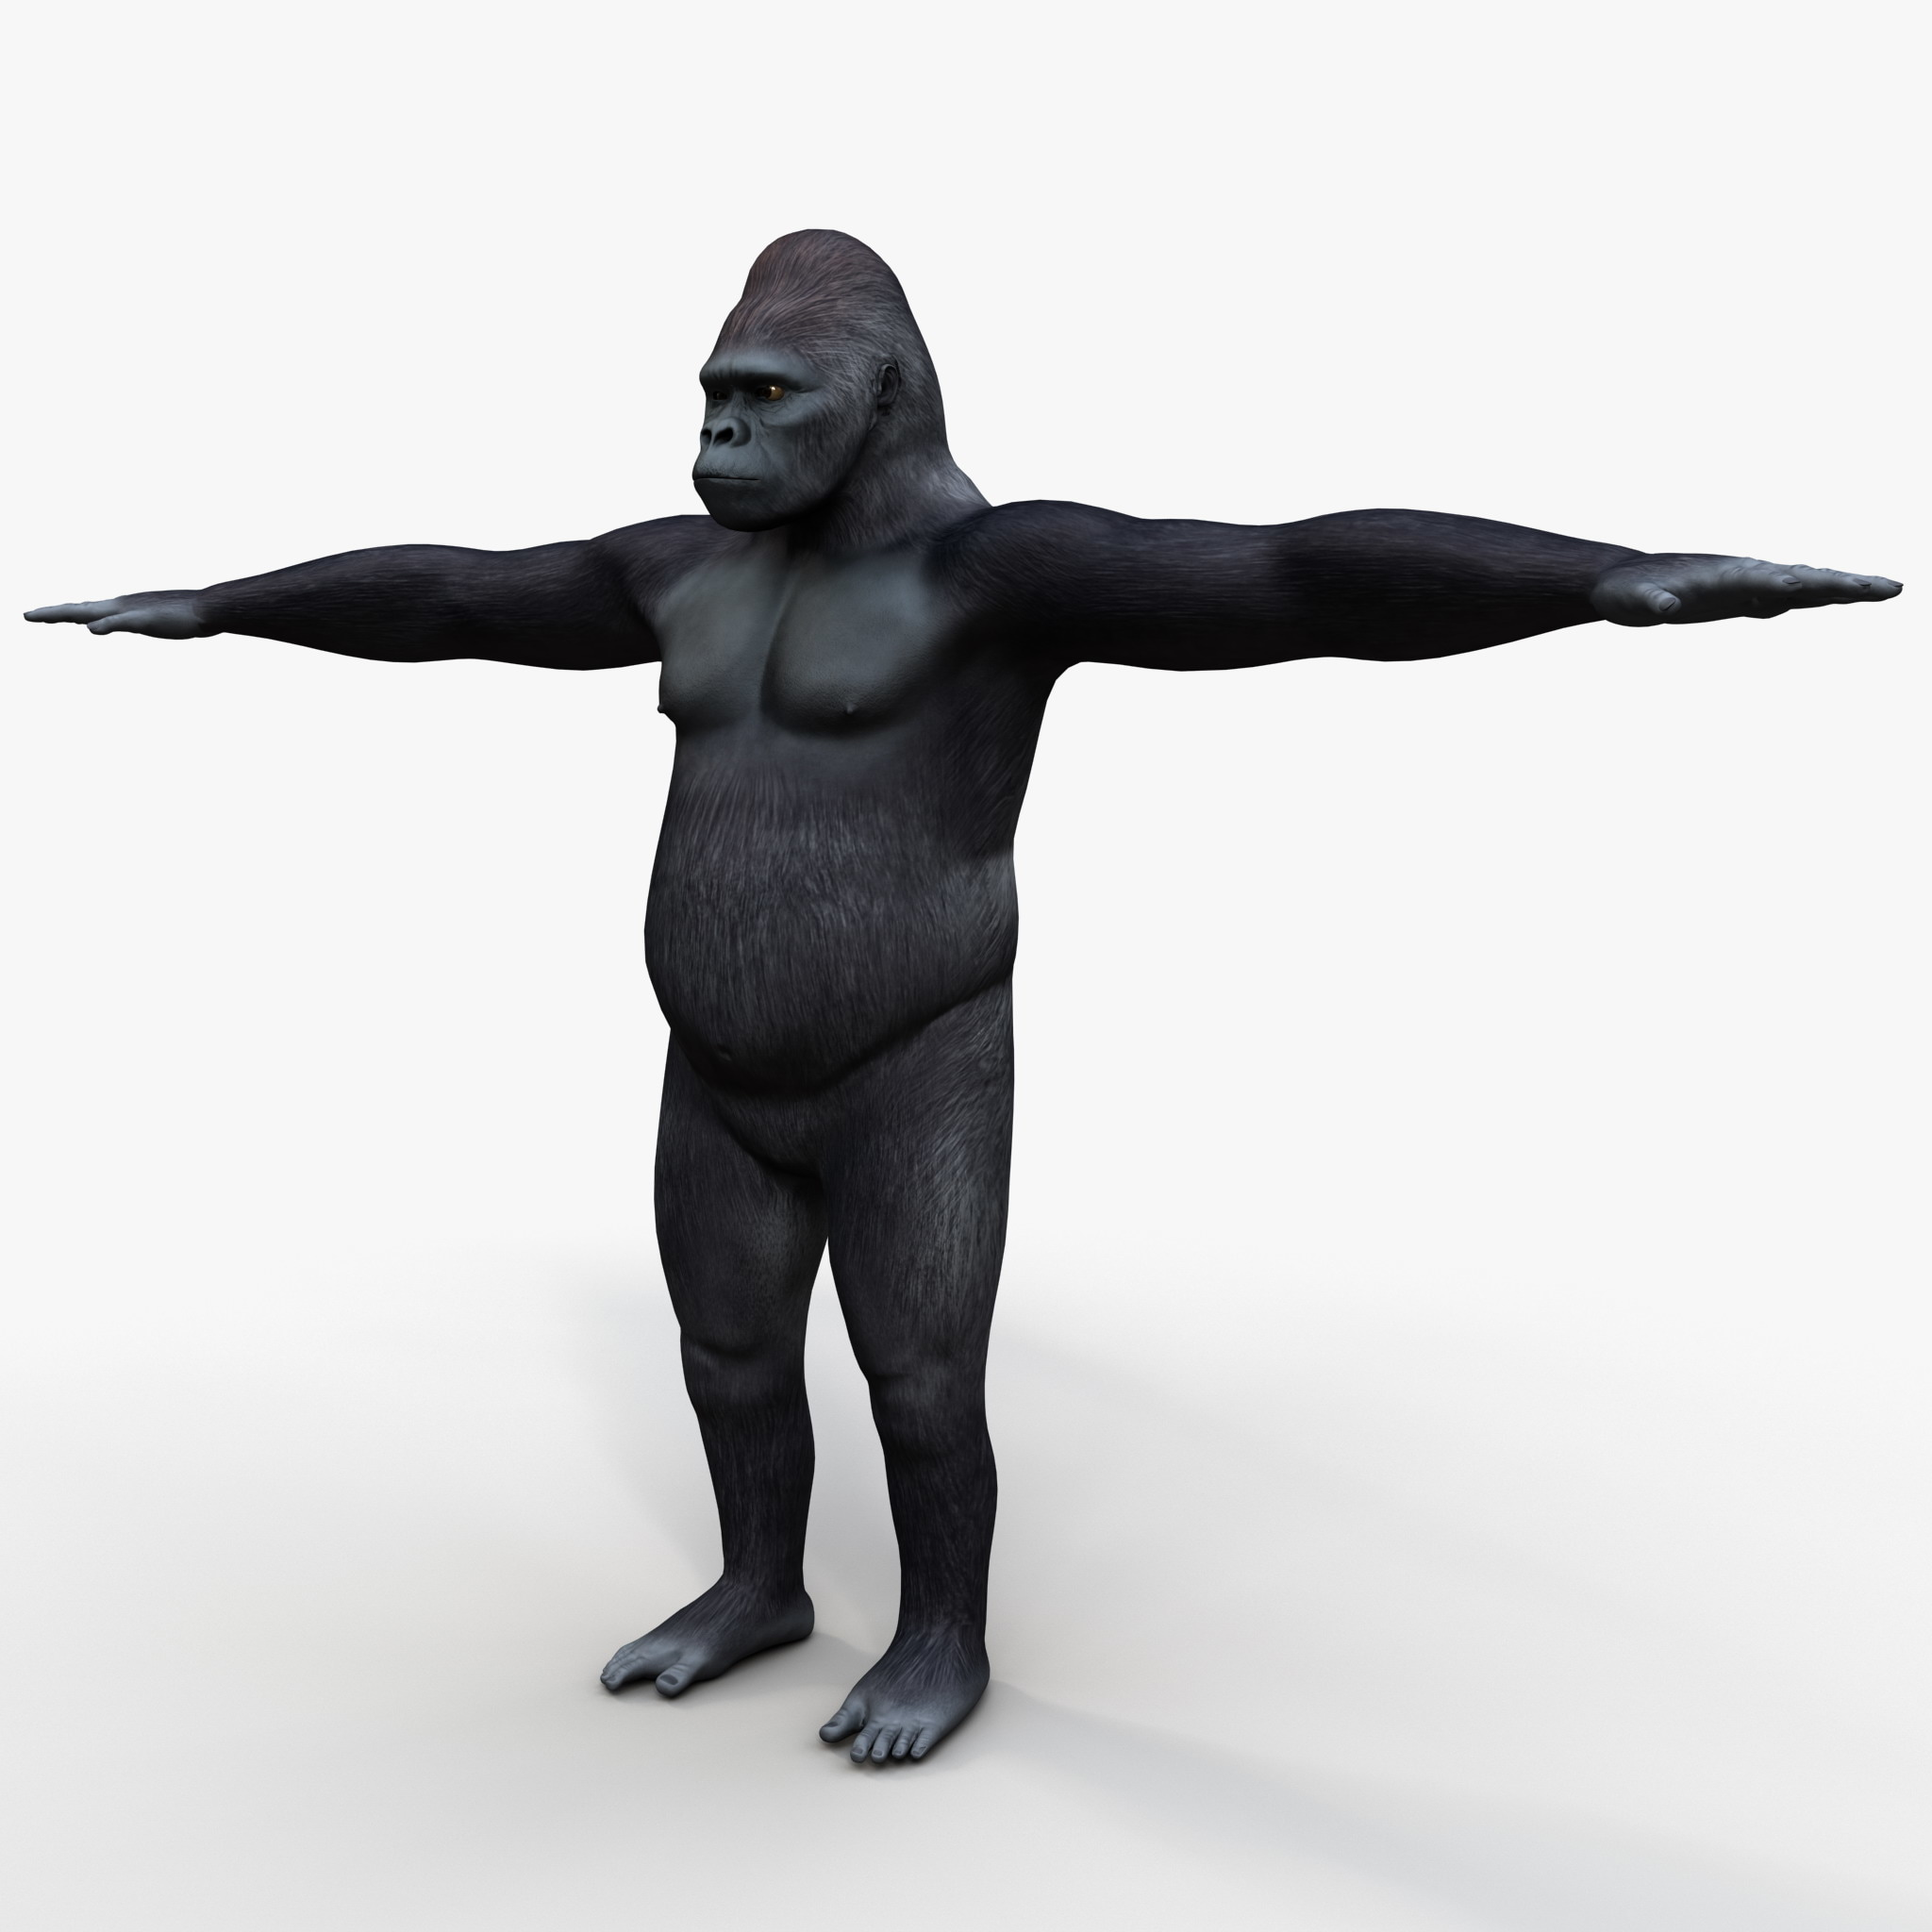 3d sex gorillas nude download